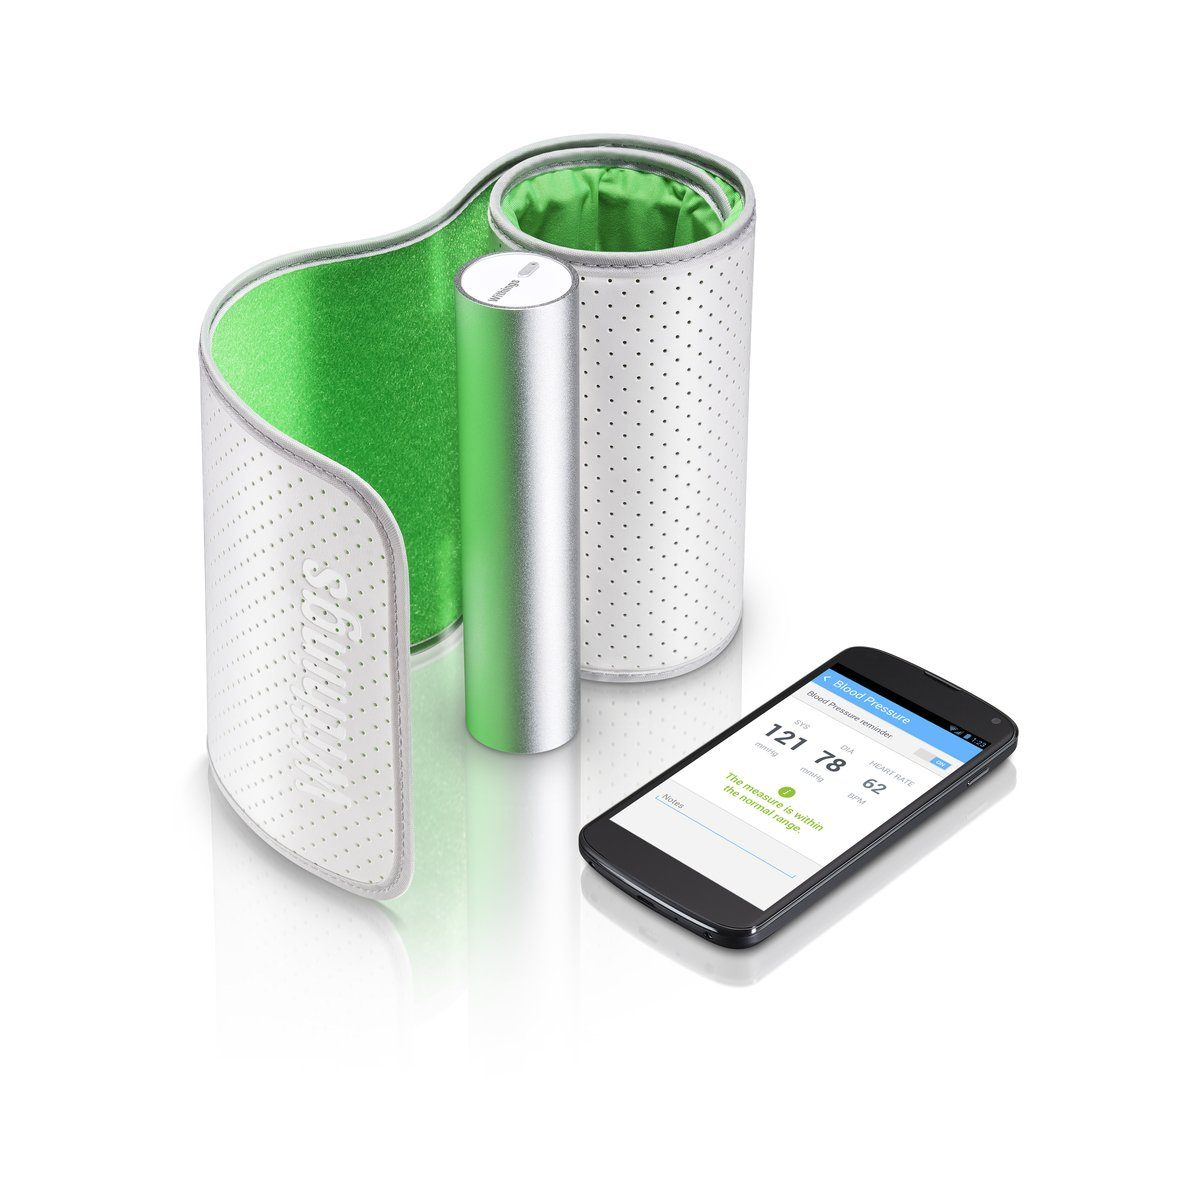 Withings Blutdruckmessgerät »Wireless Blood Pressure Monitor«